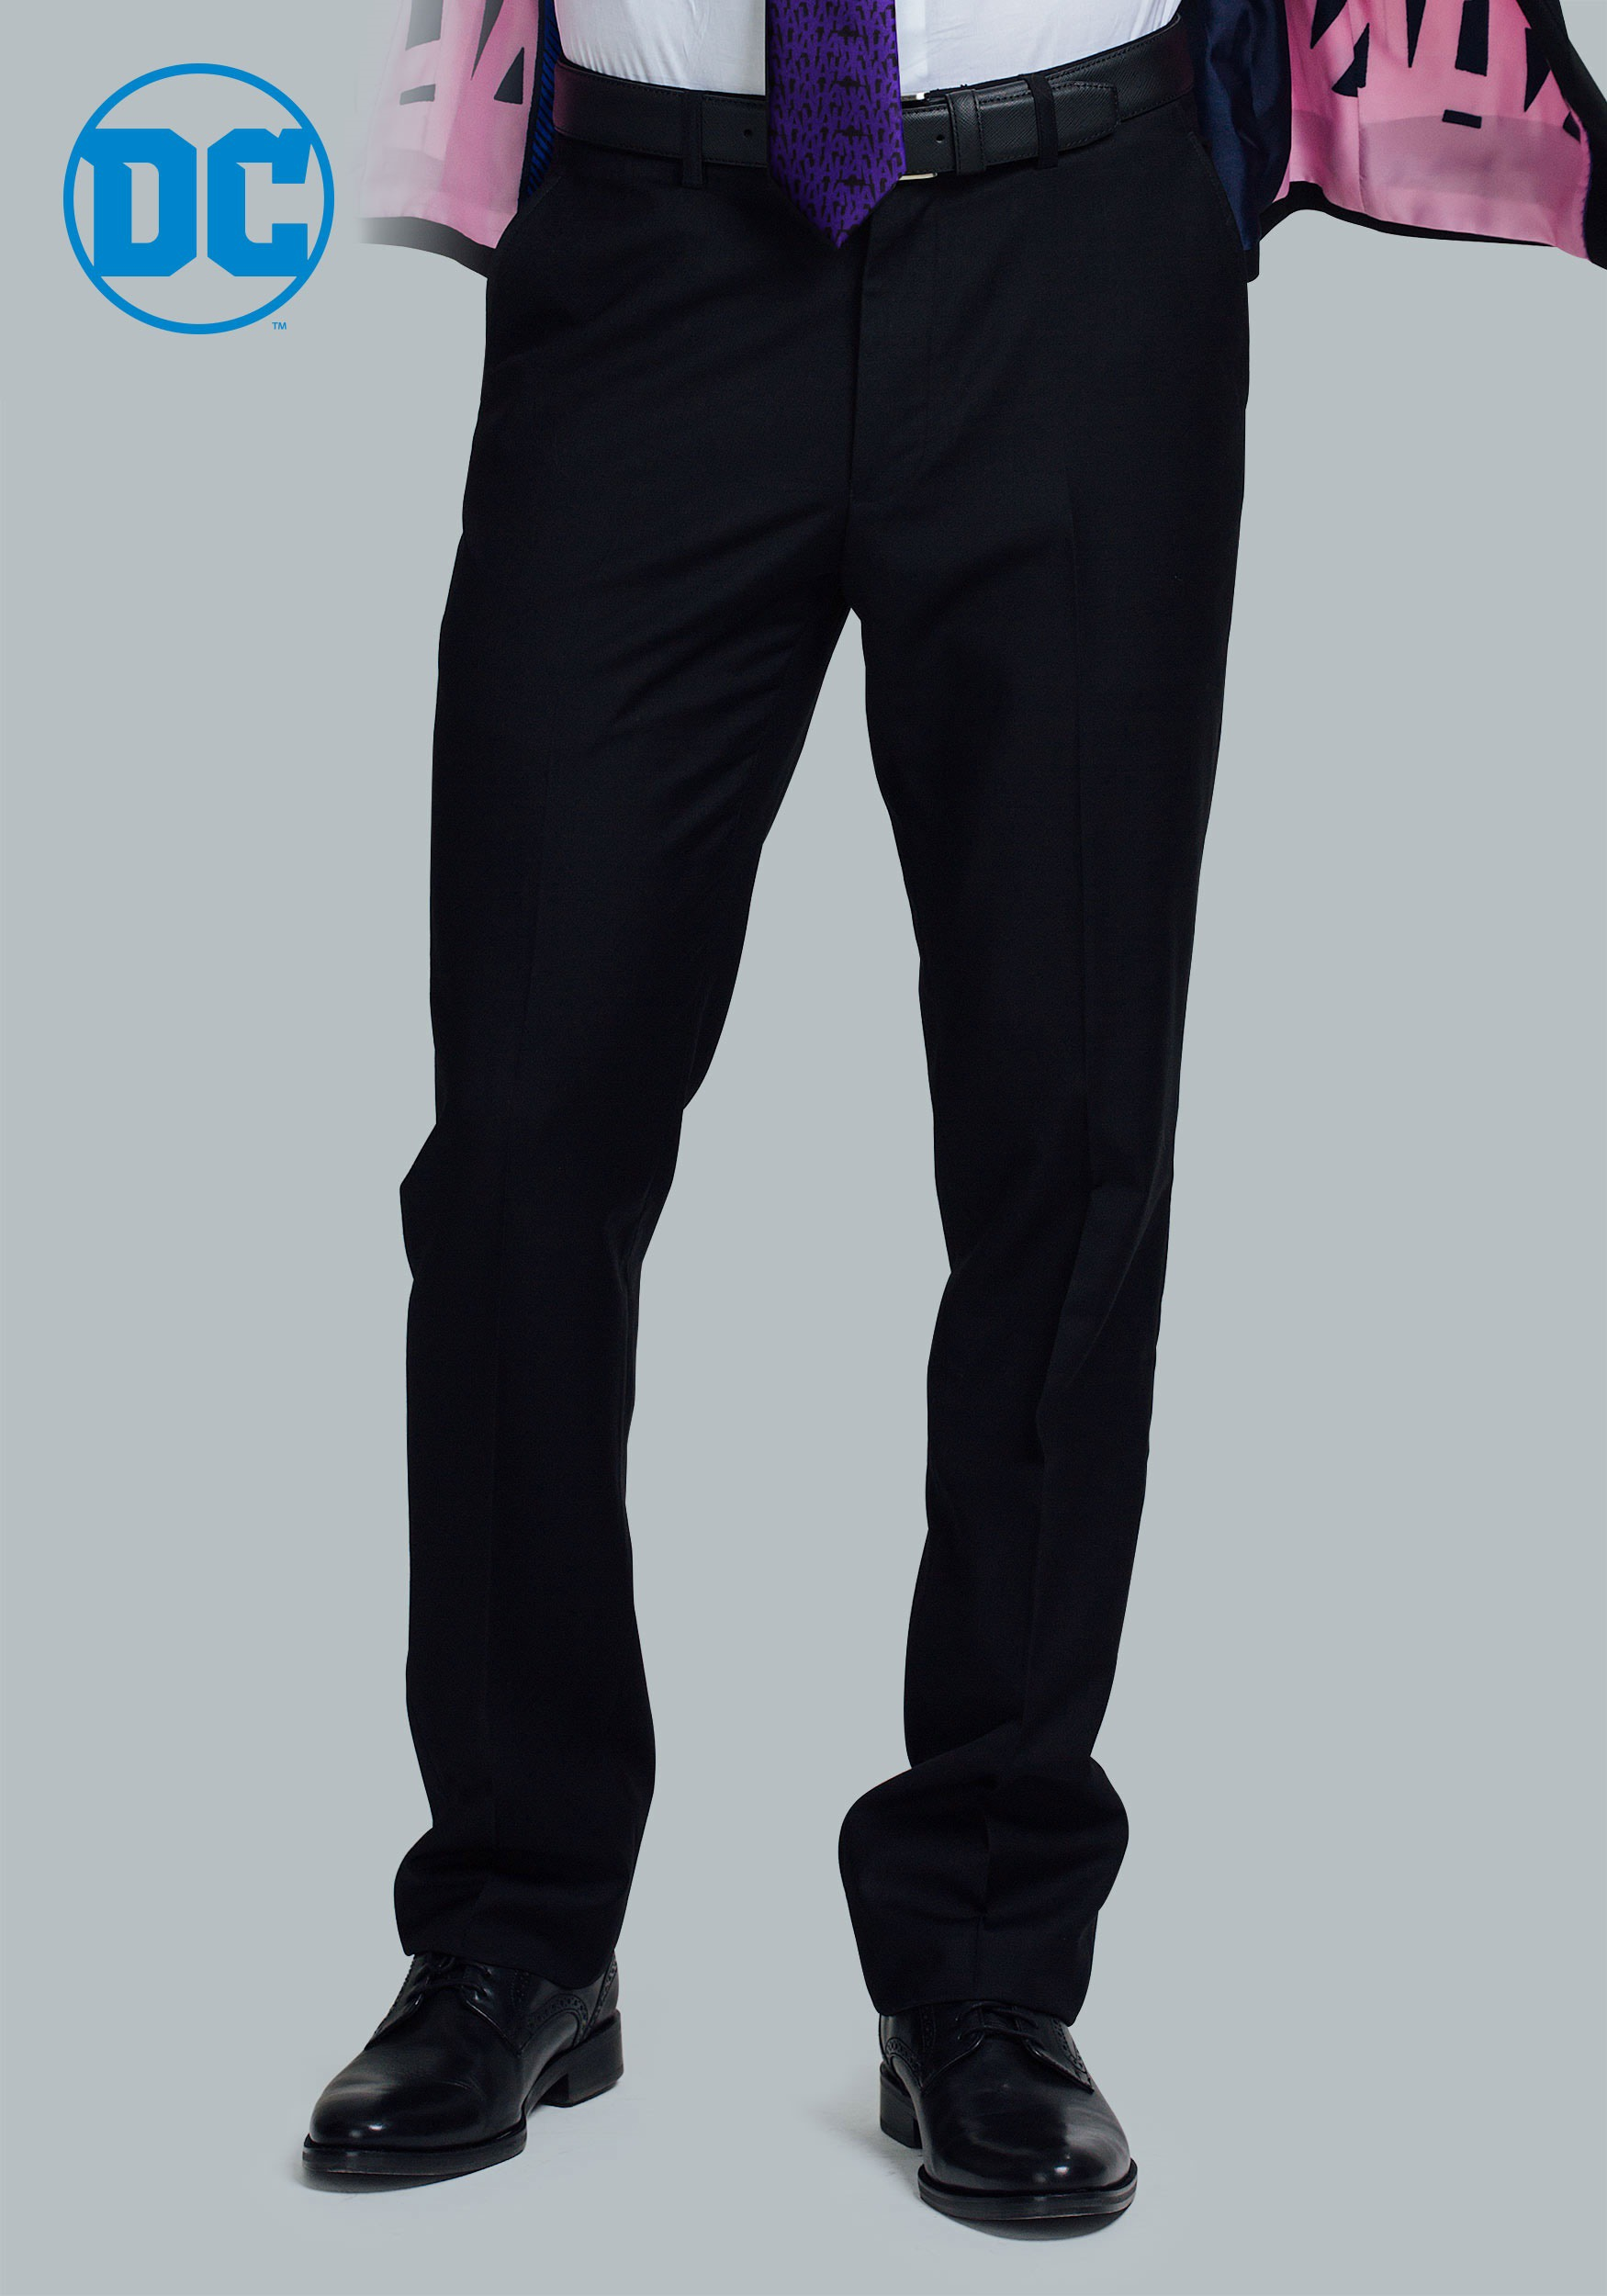 the joker slim fit suit pants secret identity. Black Bedroom Furniture Sets. Home Design Ideas